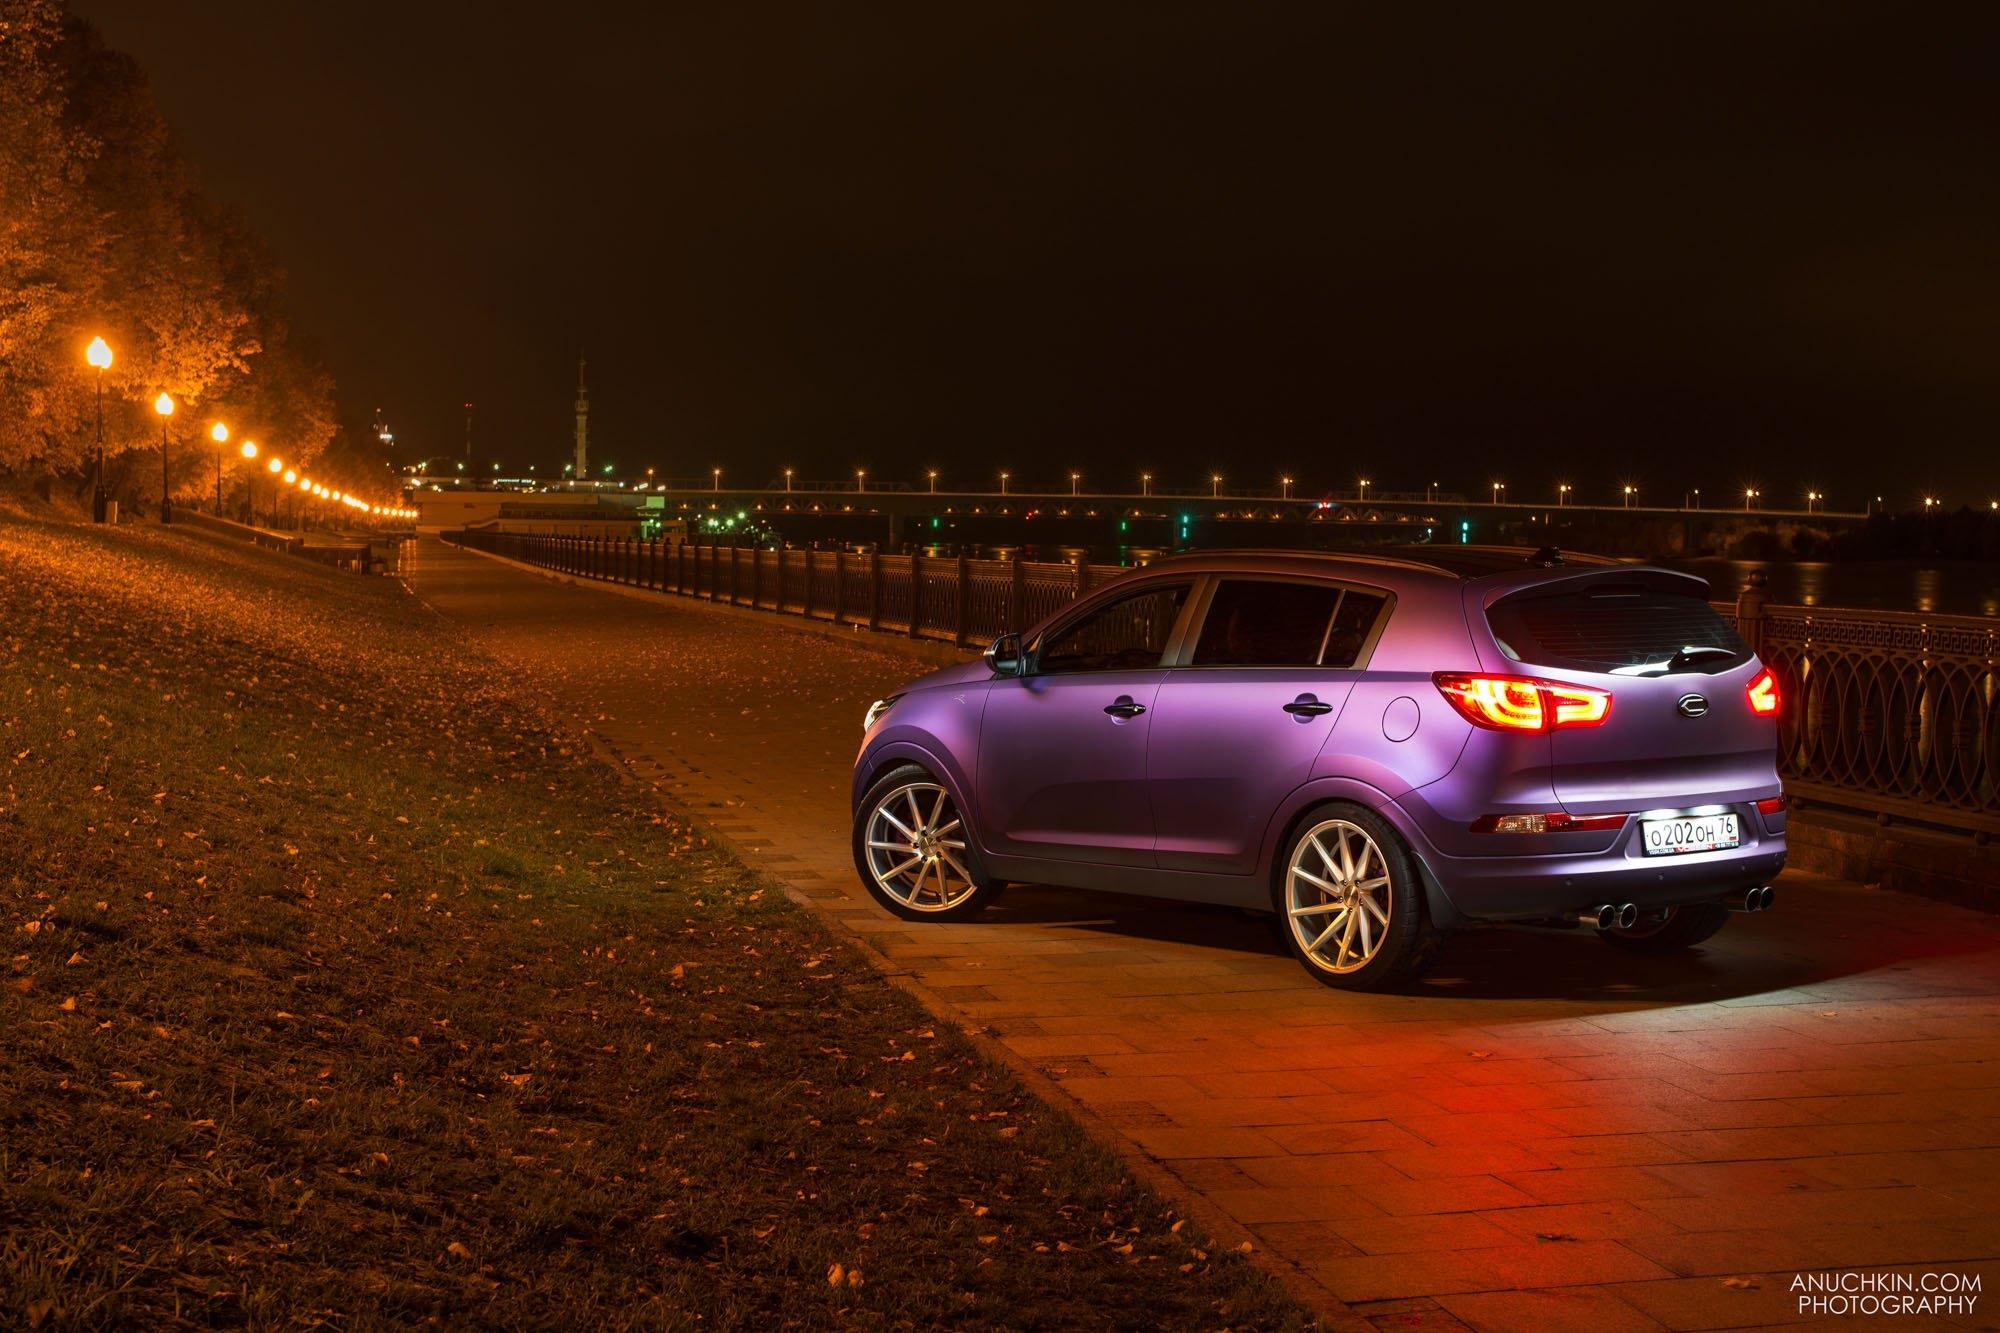 Custom Kia Sportage Featuring Matte Purple Paint